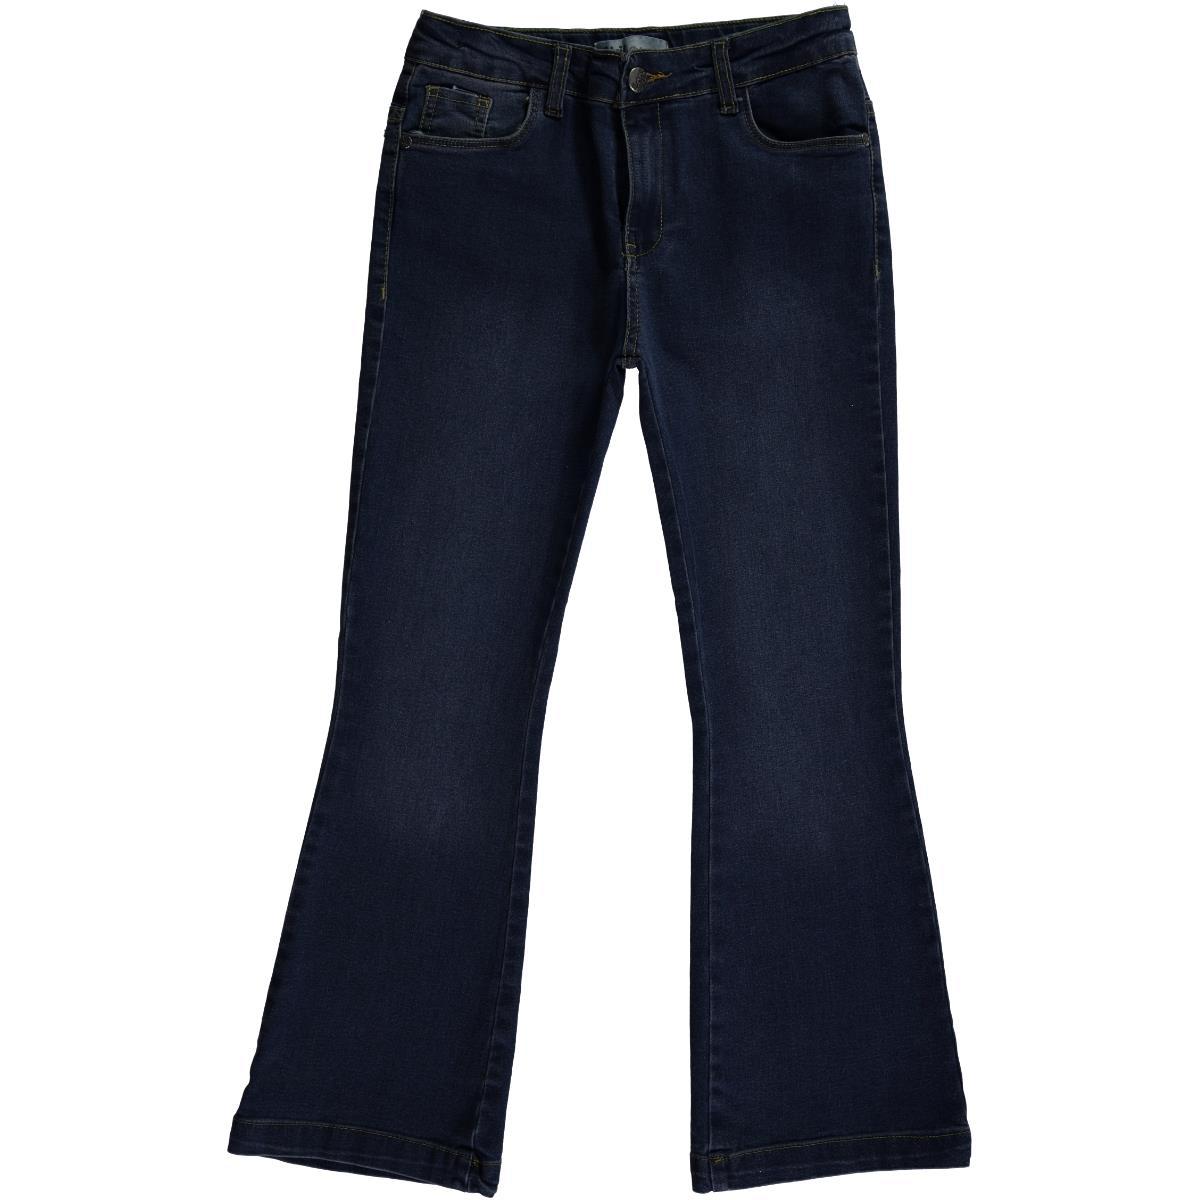 091ddc510889a Civil Girls Kız Çocuk Kot Pantolon 10-13 Yaş Mavi